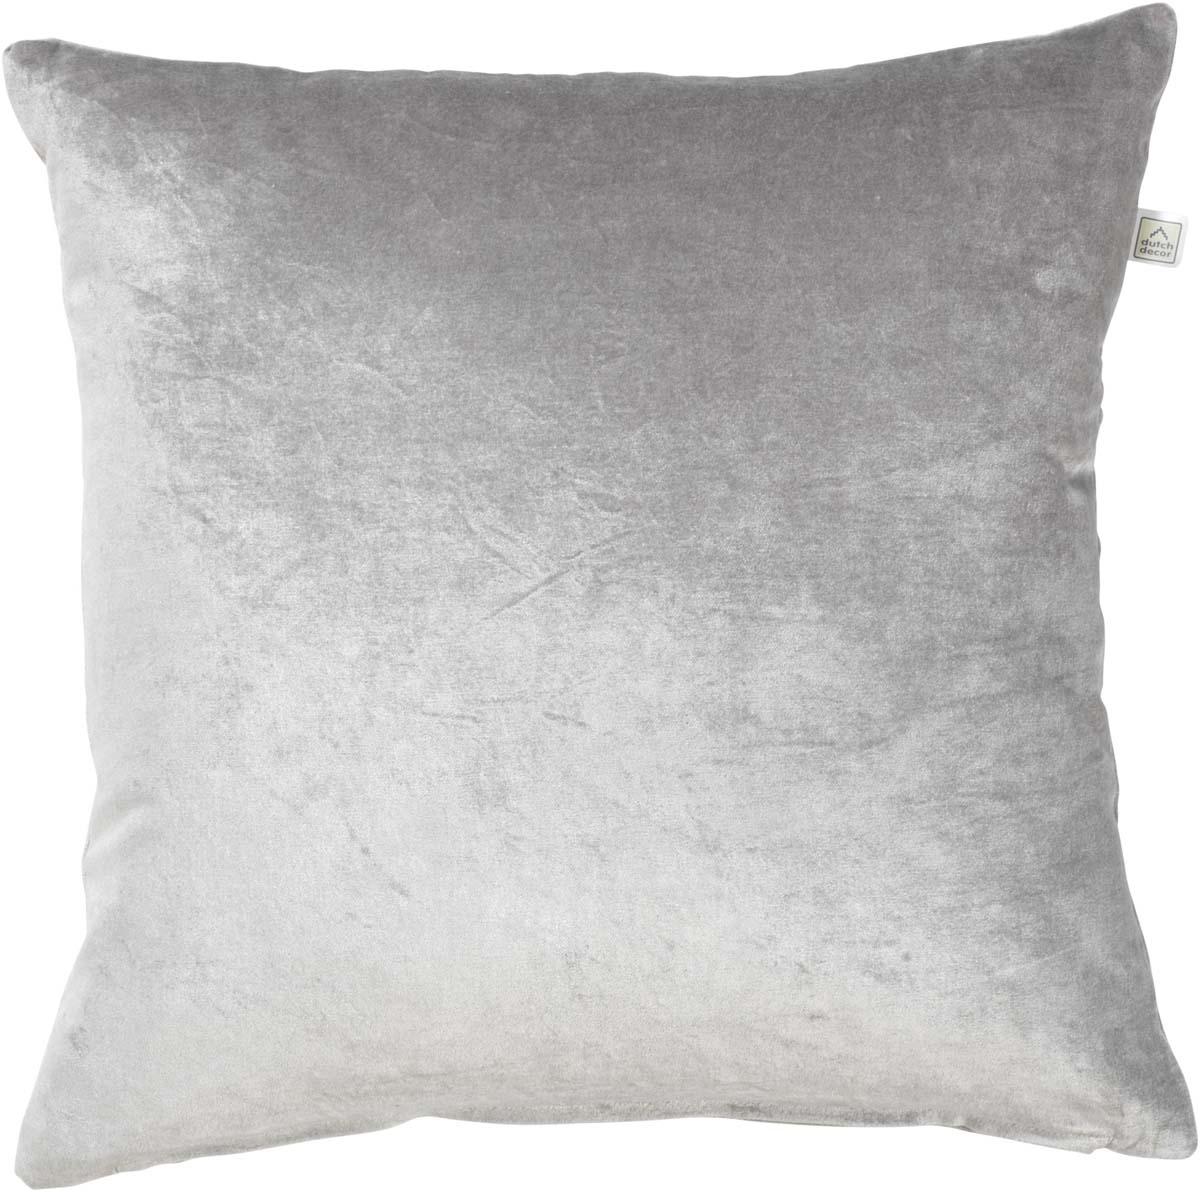 CIDO - Sierkussen velvet midden grijs 45x45 cm